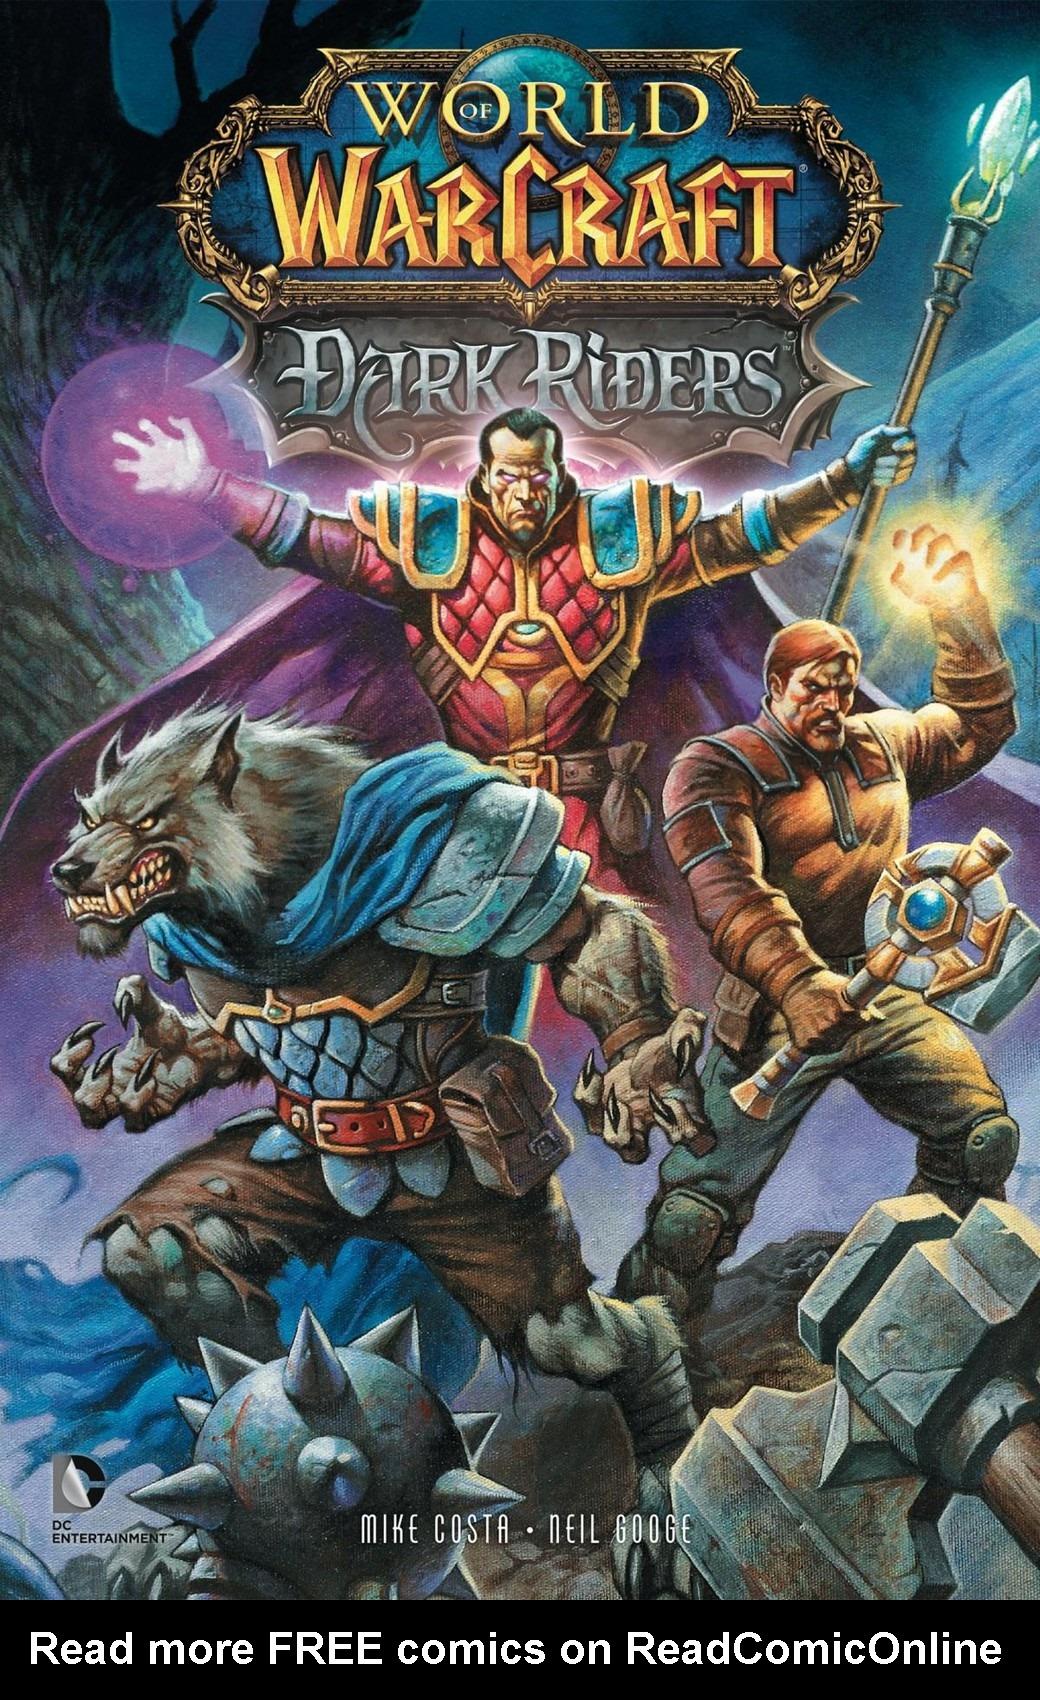 Read online World of Warcraft: Dark Riders comic -  Issue # Full - 1